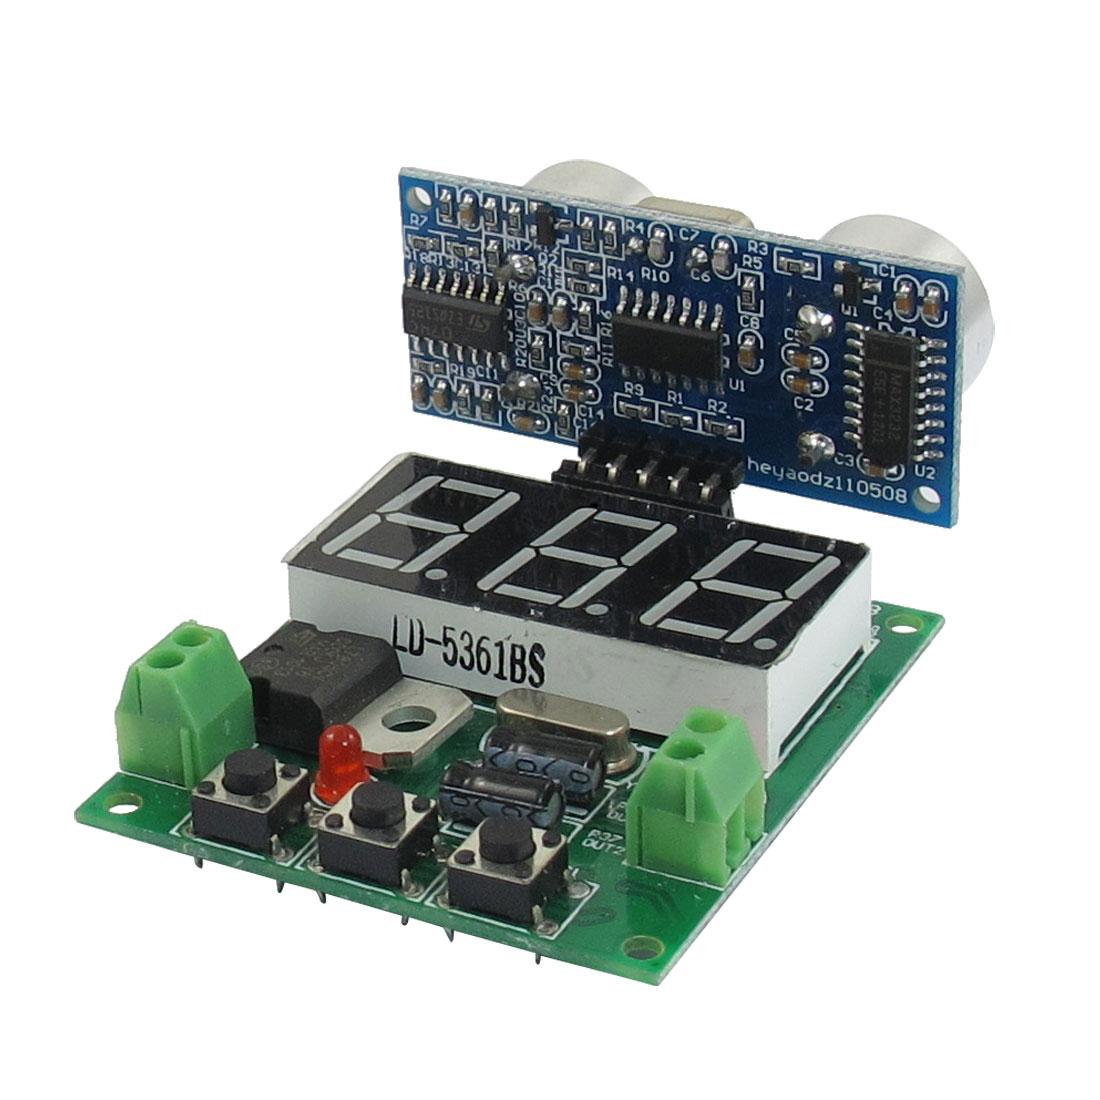 DC 5V 15mA 3cm-350cm Distance Ultrasonic Wave Sensor Module SRF05/DYP-ME008